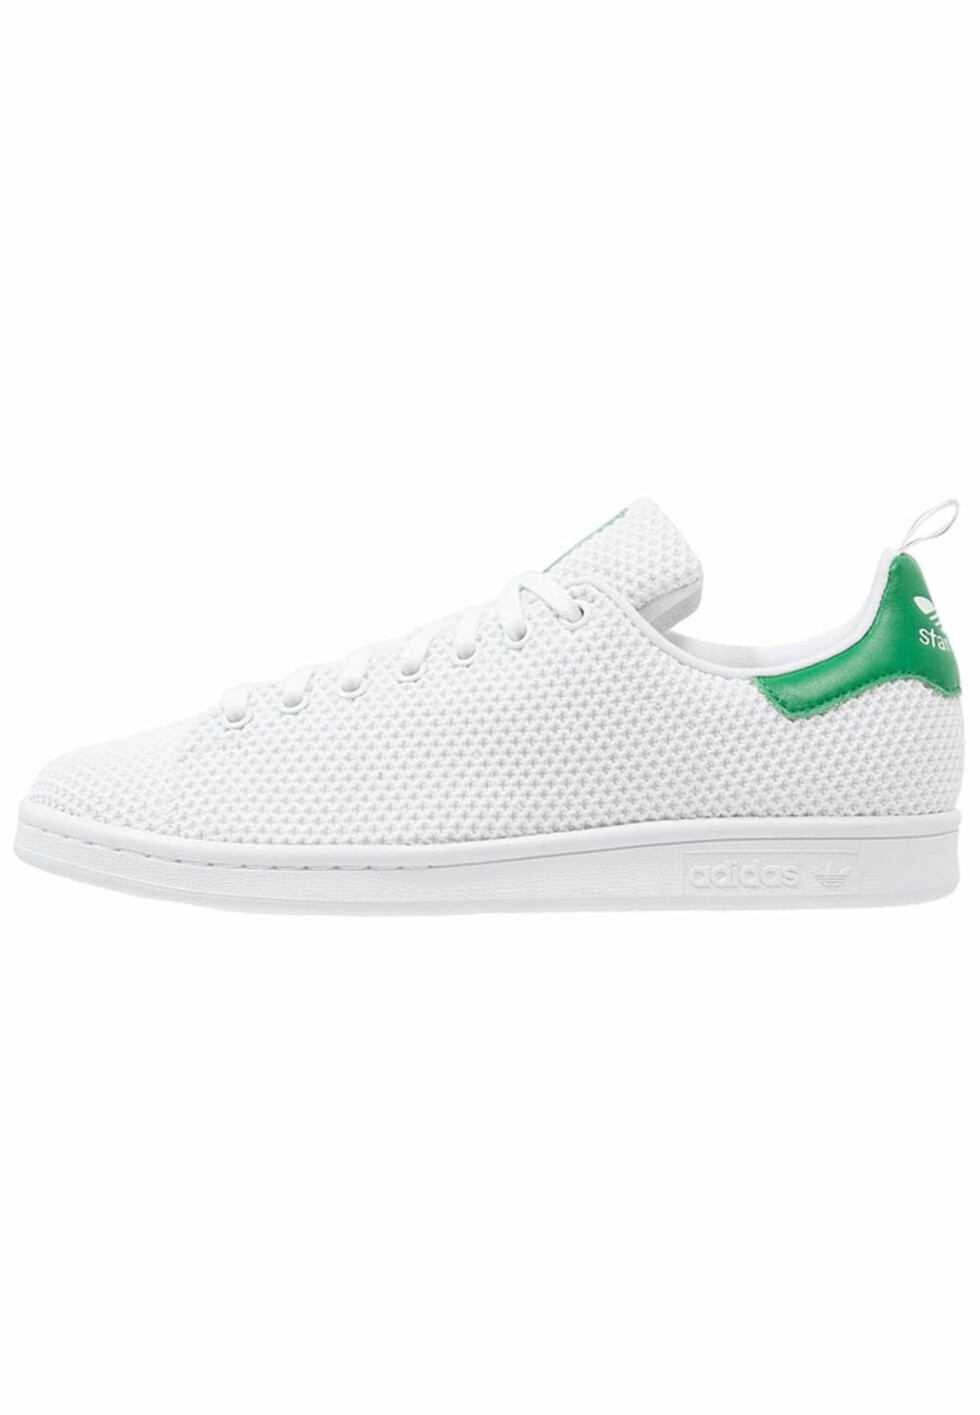 Stan Smith-sneakers fra Adidas med grønn detalj bak via Zalando.no | kr 949 | pn.zalando.net/go.cgi?pid=1173&wmid=cc&cpid=12&target=http://www.zalando.no/adidas-originals-joggesko-white-green-ad112b0ht-a11.html